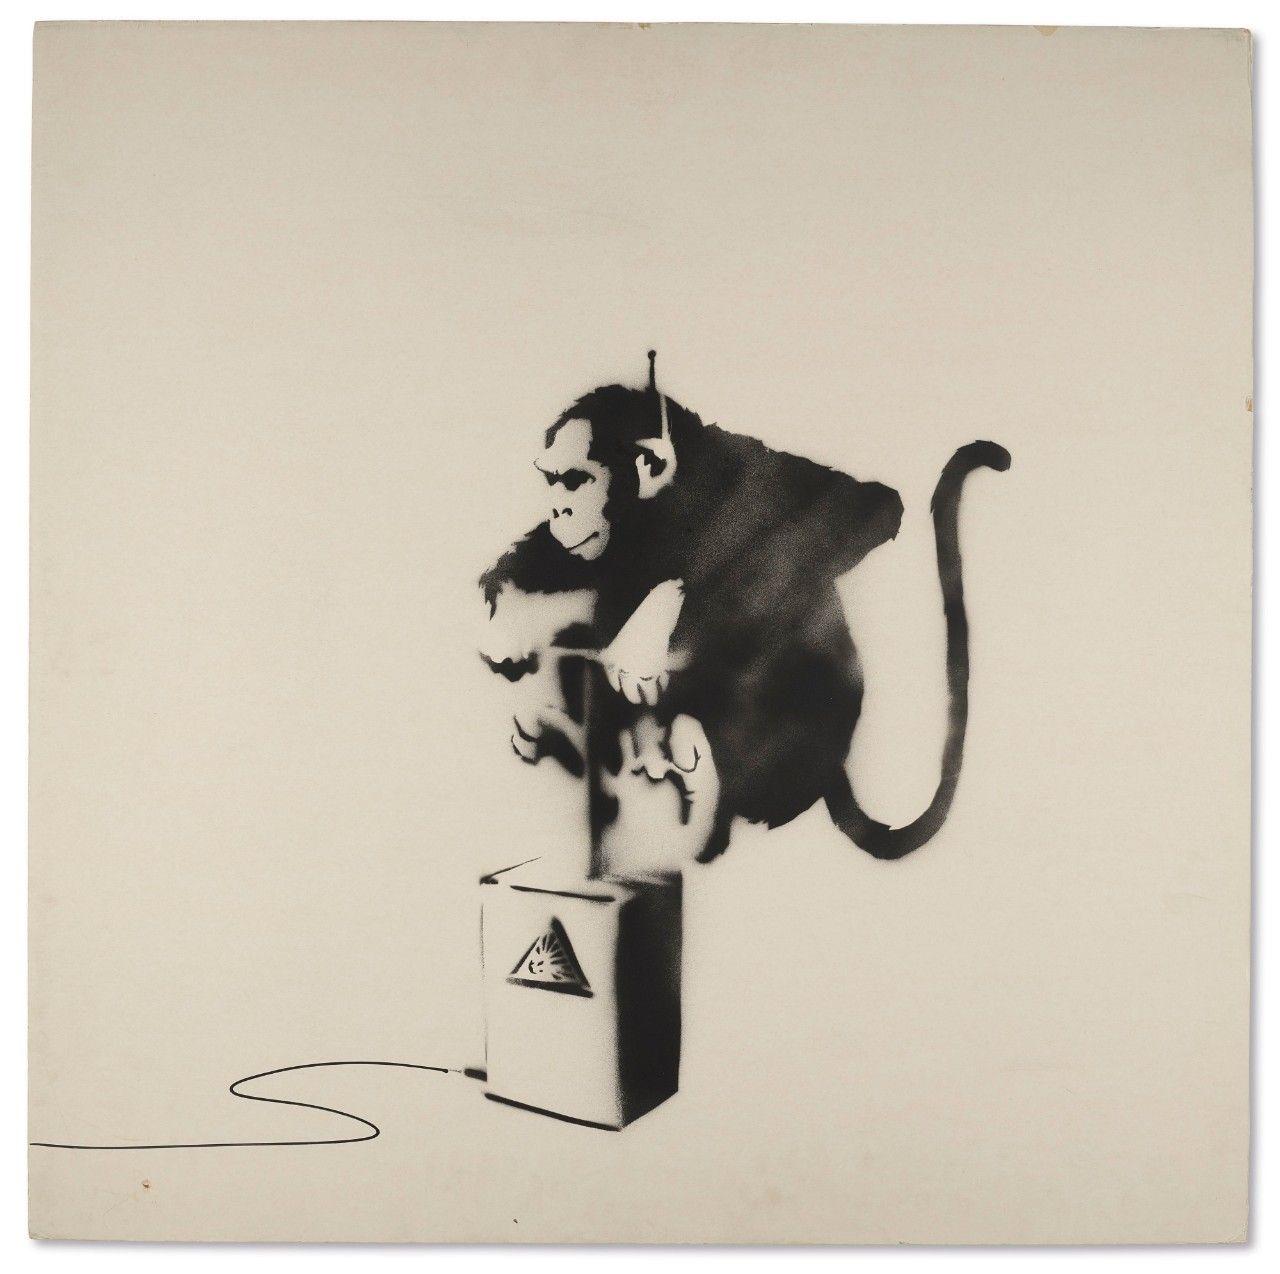 Banksy 2018 Auction Results. Banksy Monkey Detonator